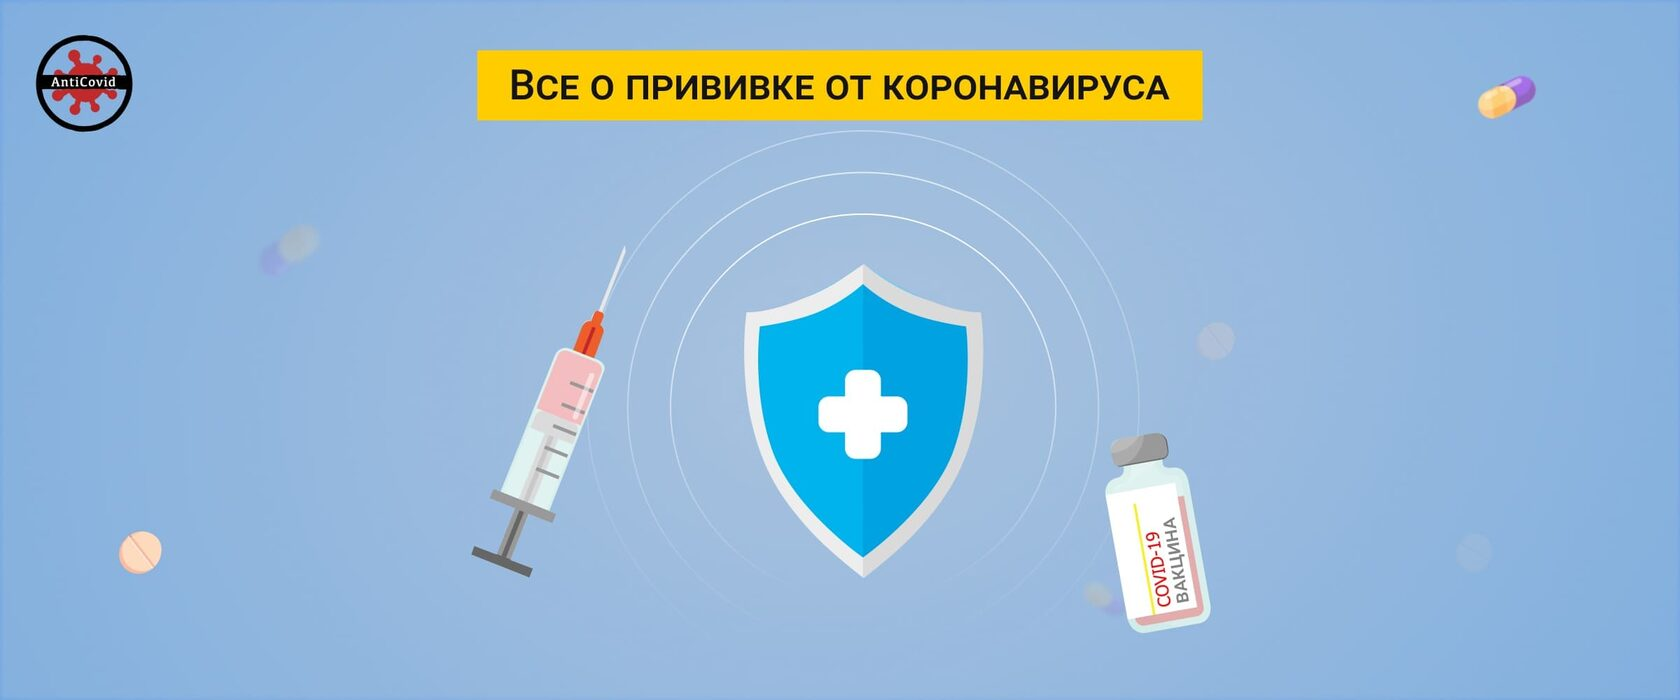 Все о прививке от коронавируса